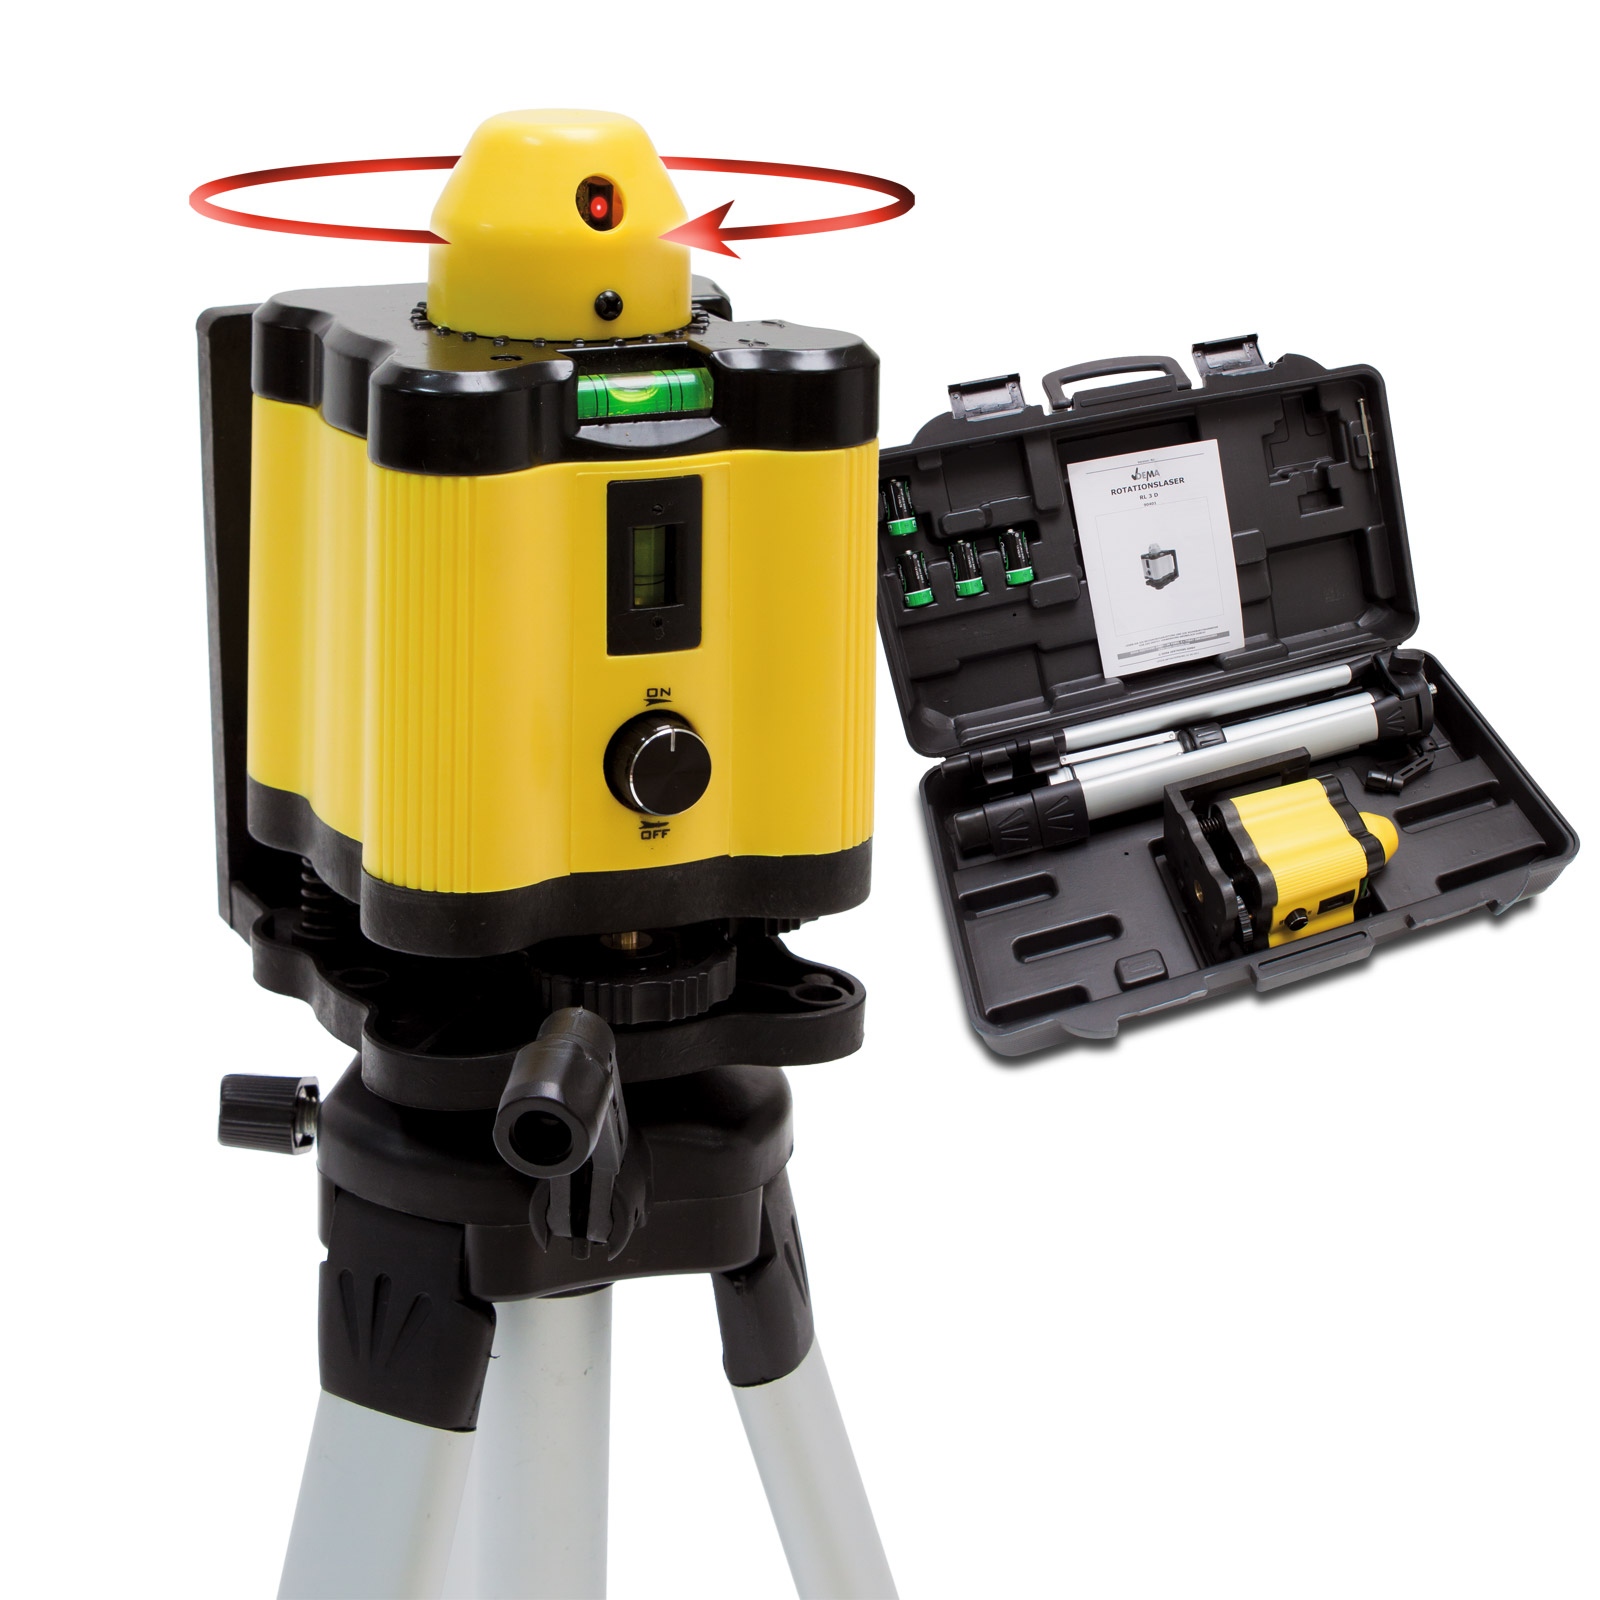 Laser Nivelliergerät Test : rotationslaser rl3e baulaser nivellierger t linienlaser rotation laser im koffer ~ Pilothousefishingboats.com Haus und Dekorationen